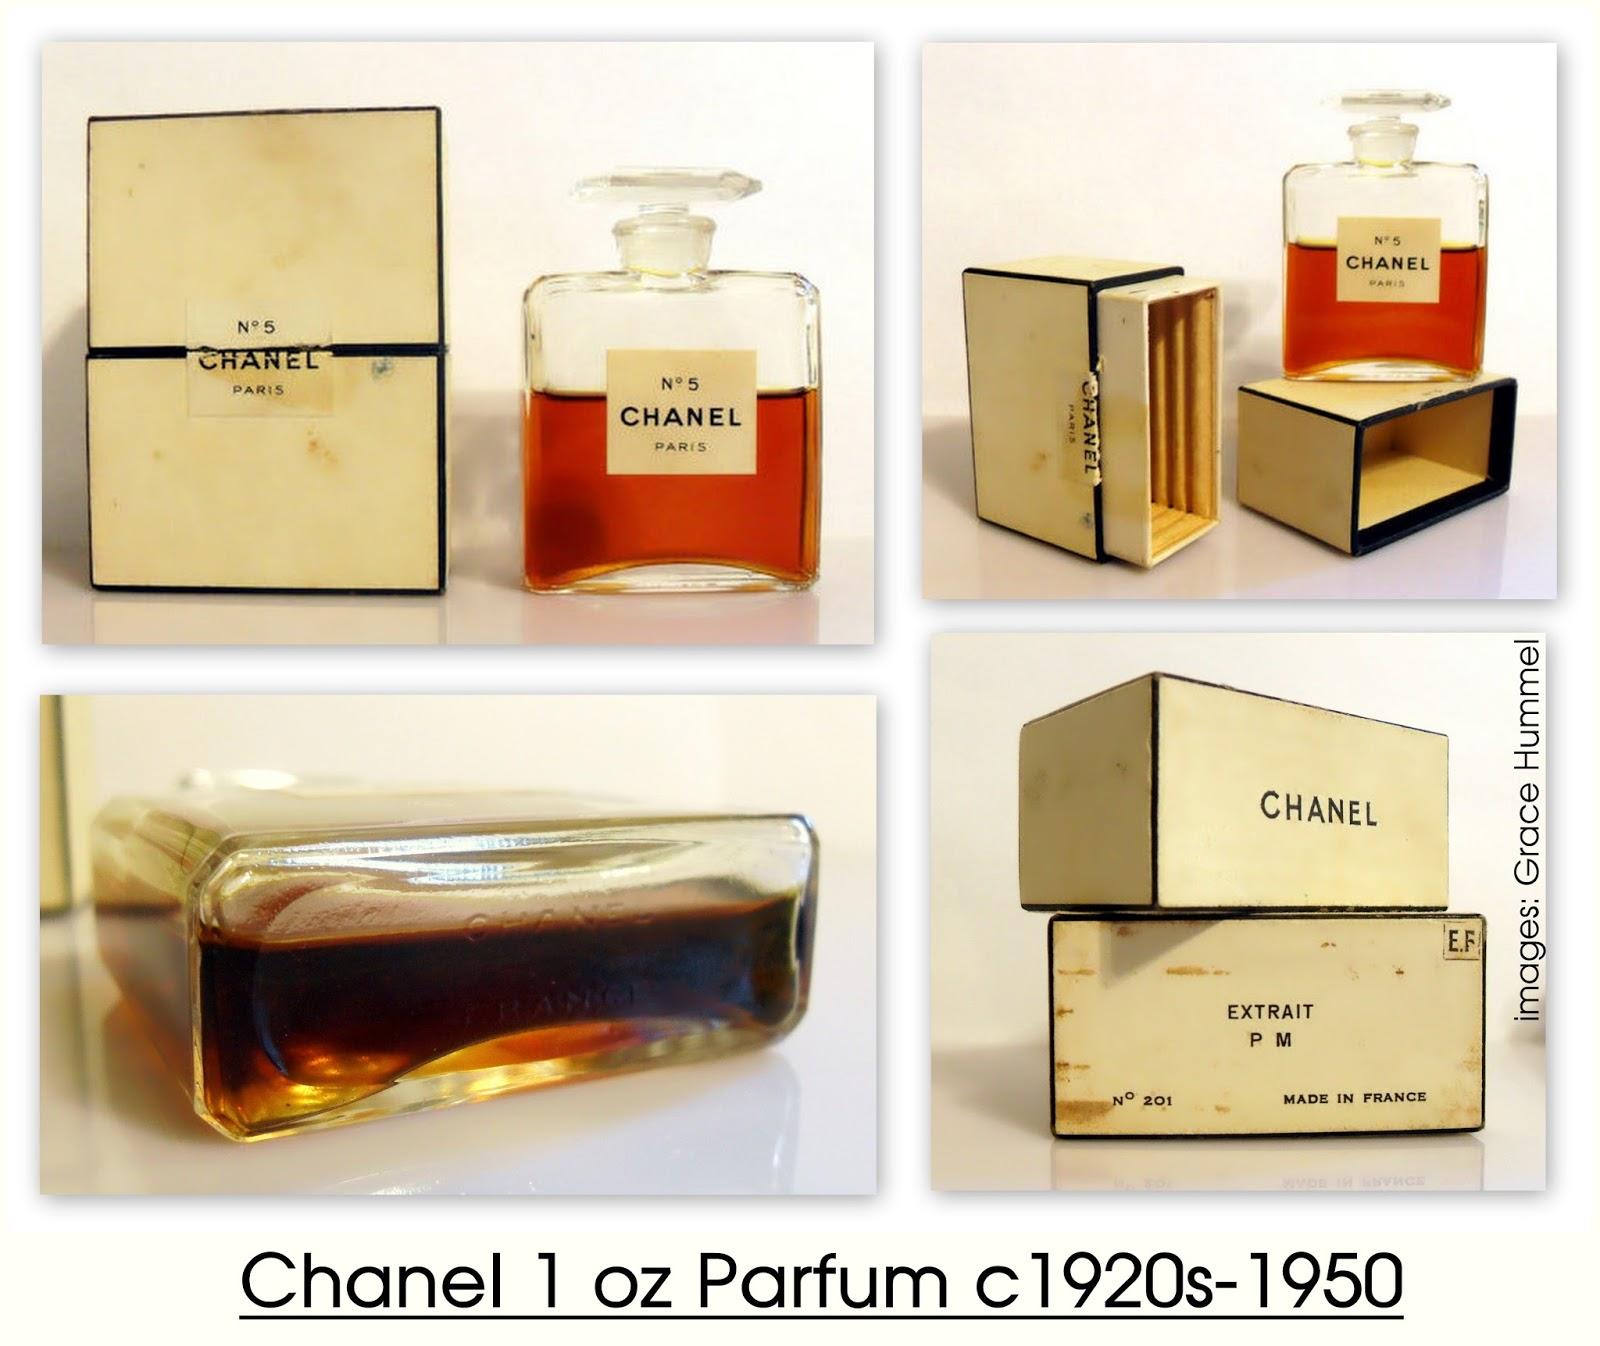 Chanel Perfume Bottles Vintage Chanel No 5 Perfume Bottles